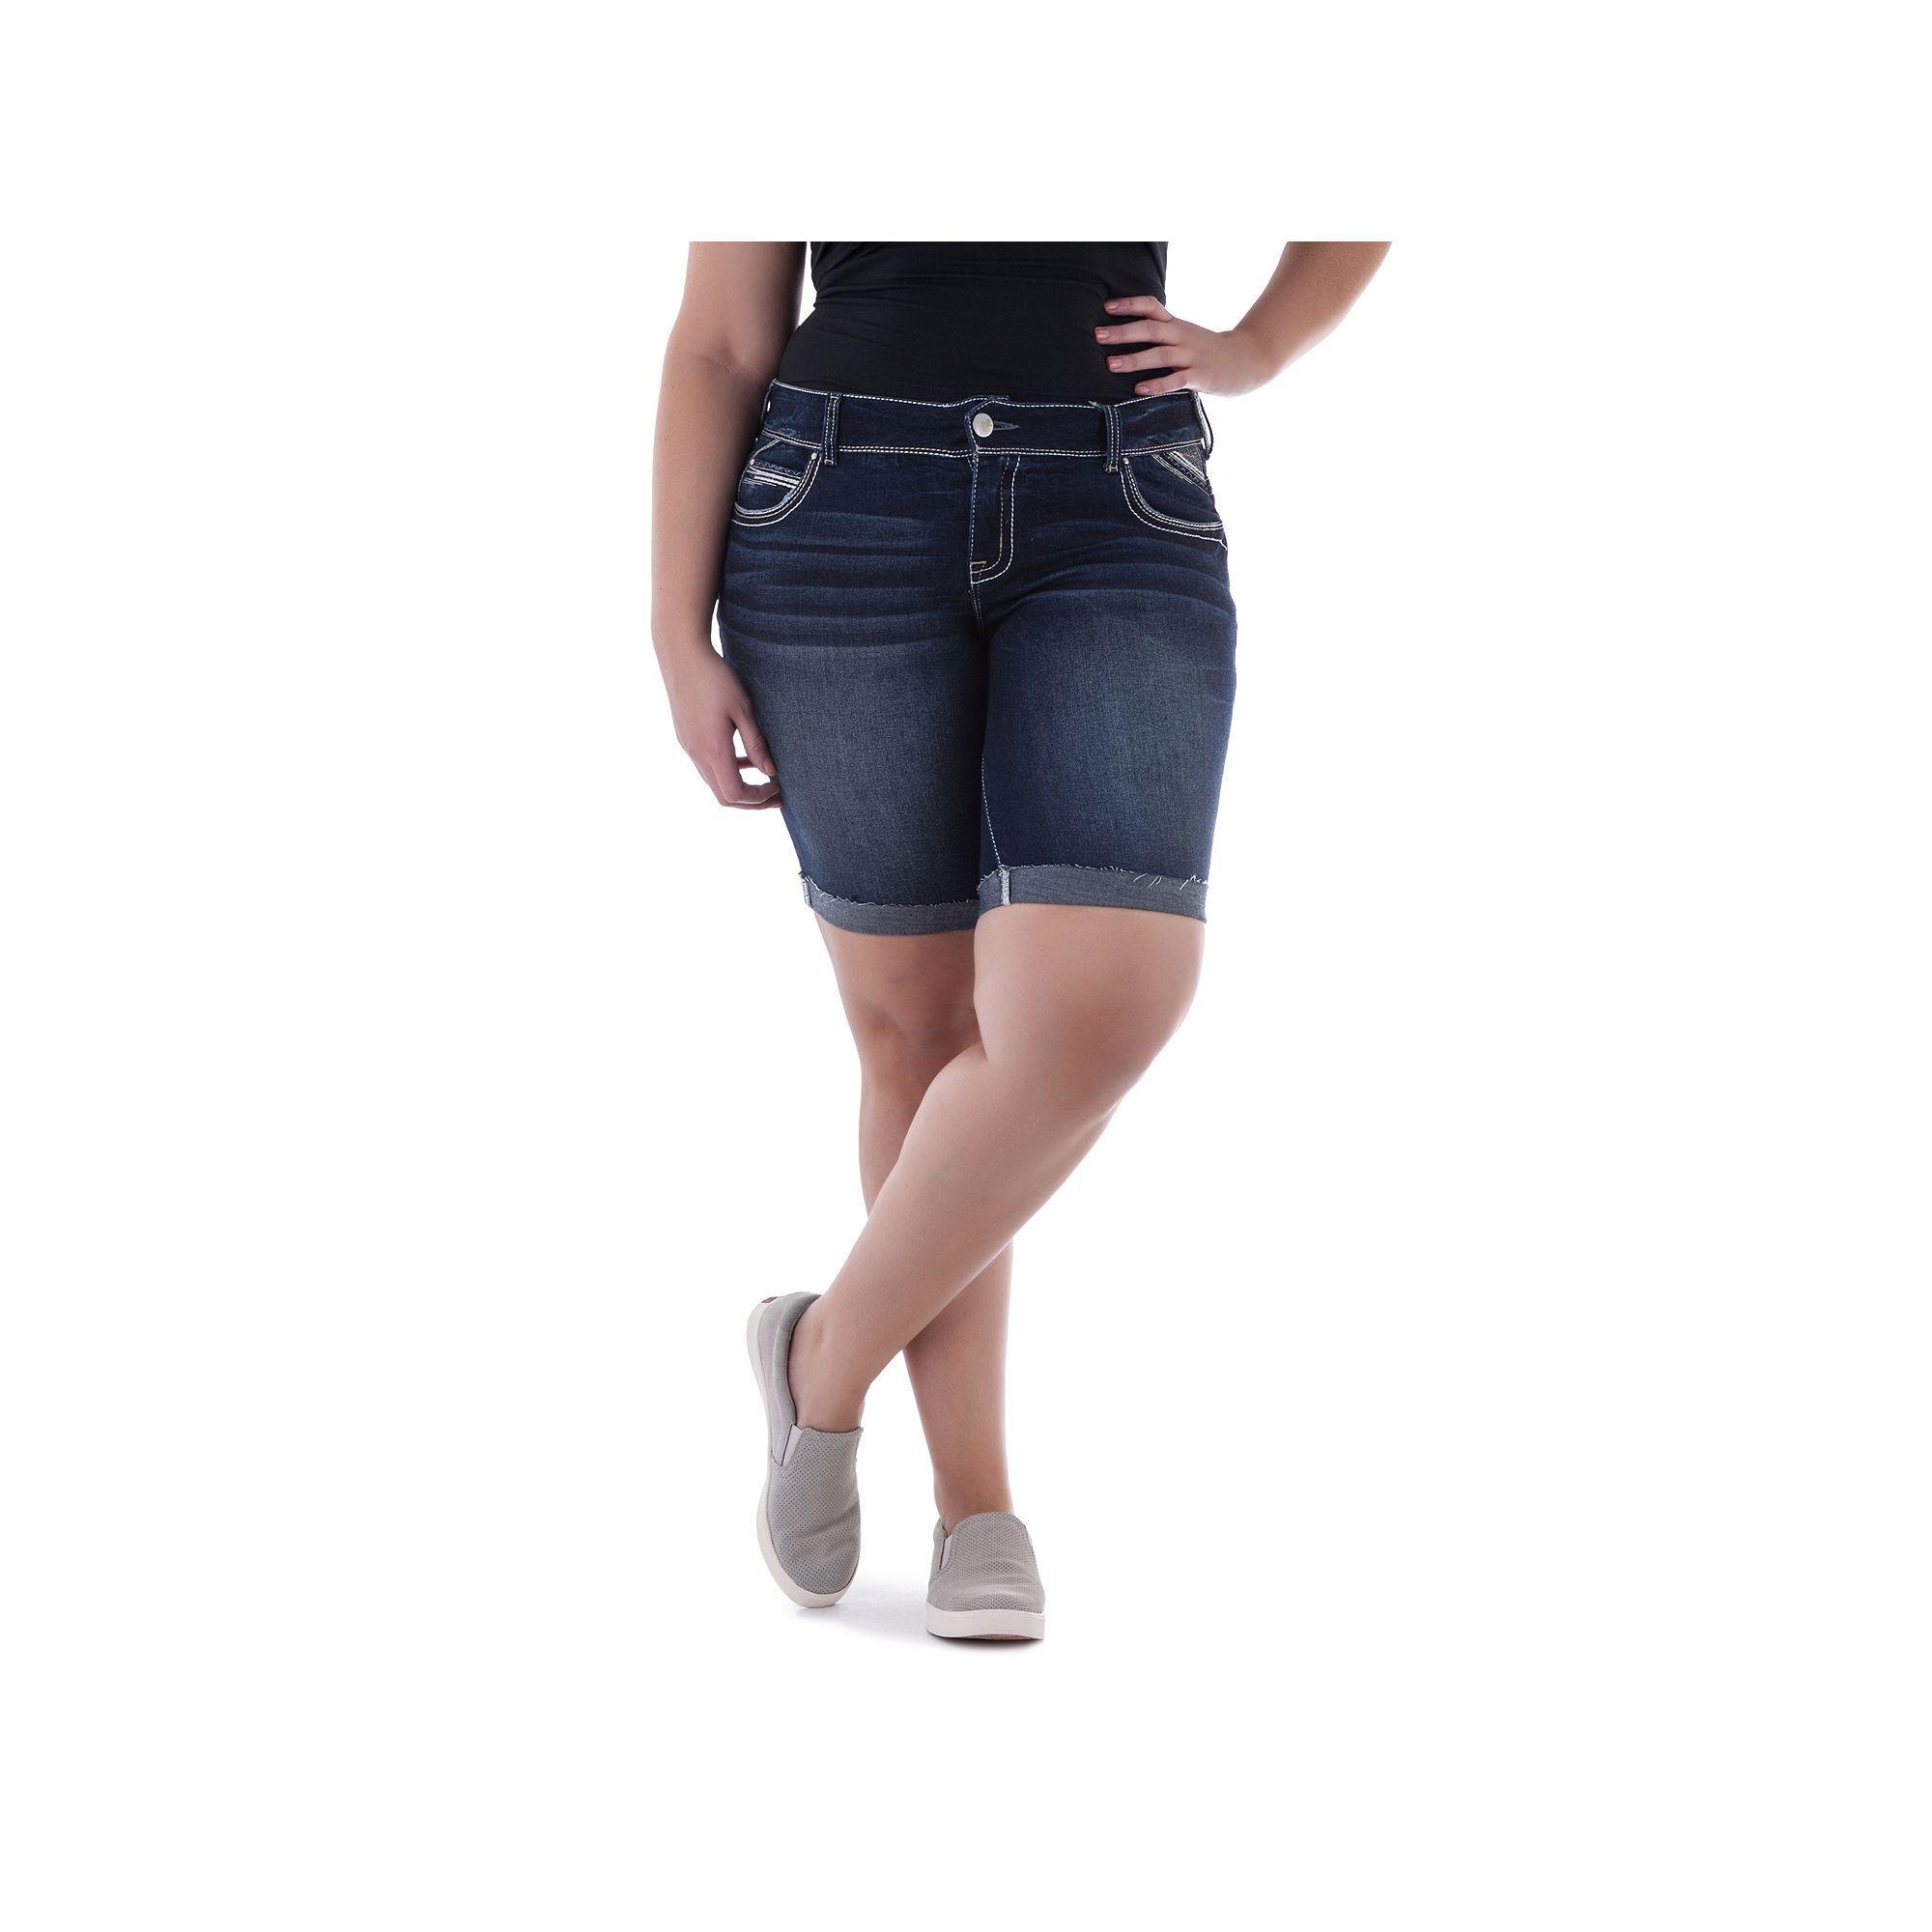 Juniors' Plus Size Amethyst Dark Wash Denim Bermuda Shorts, Teens, Size: 16  W, Dark Blue